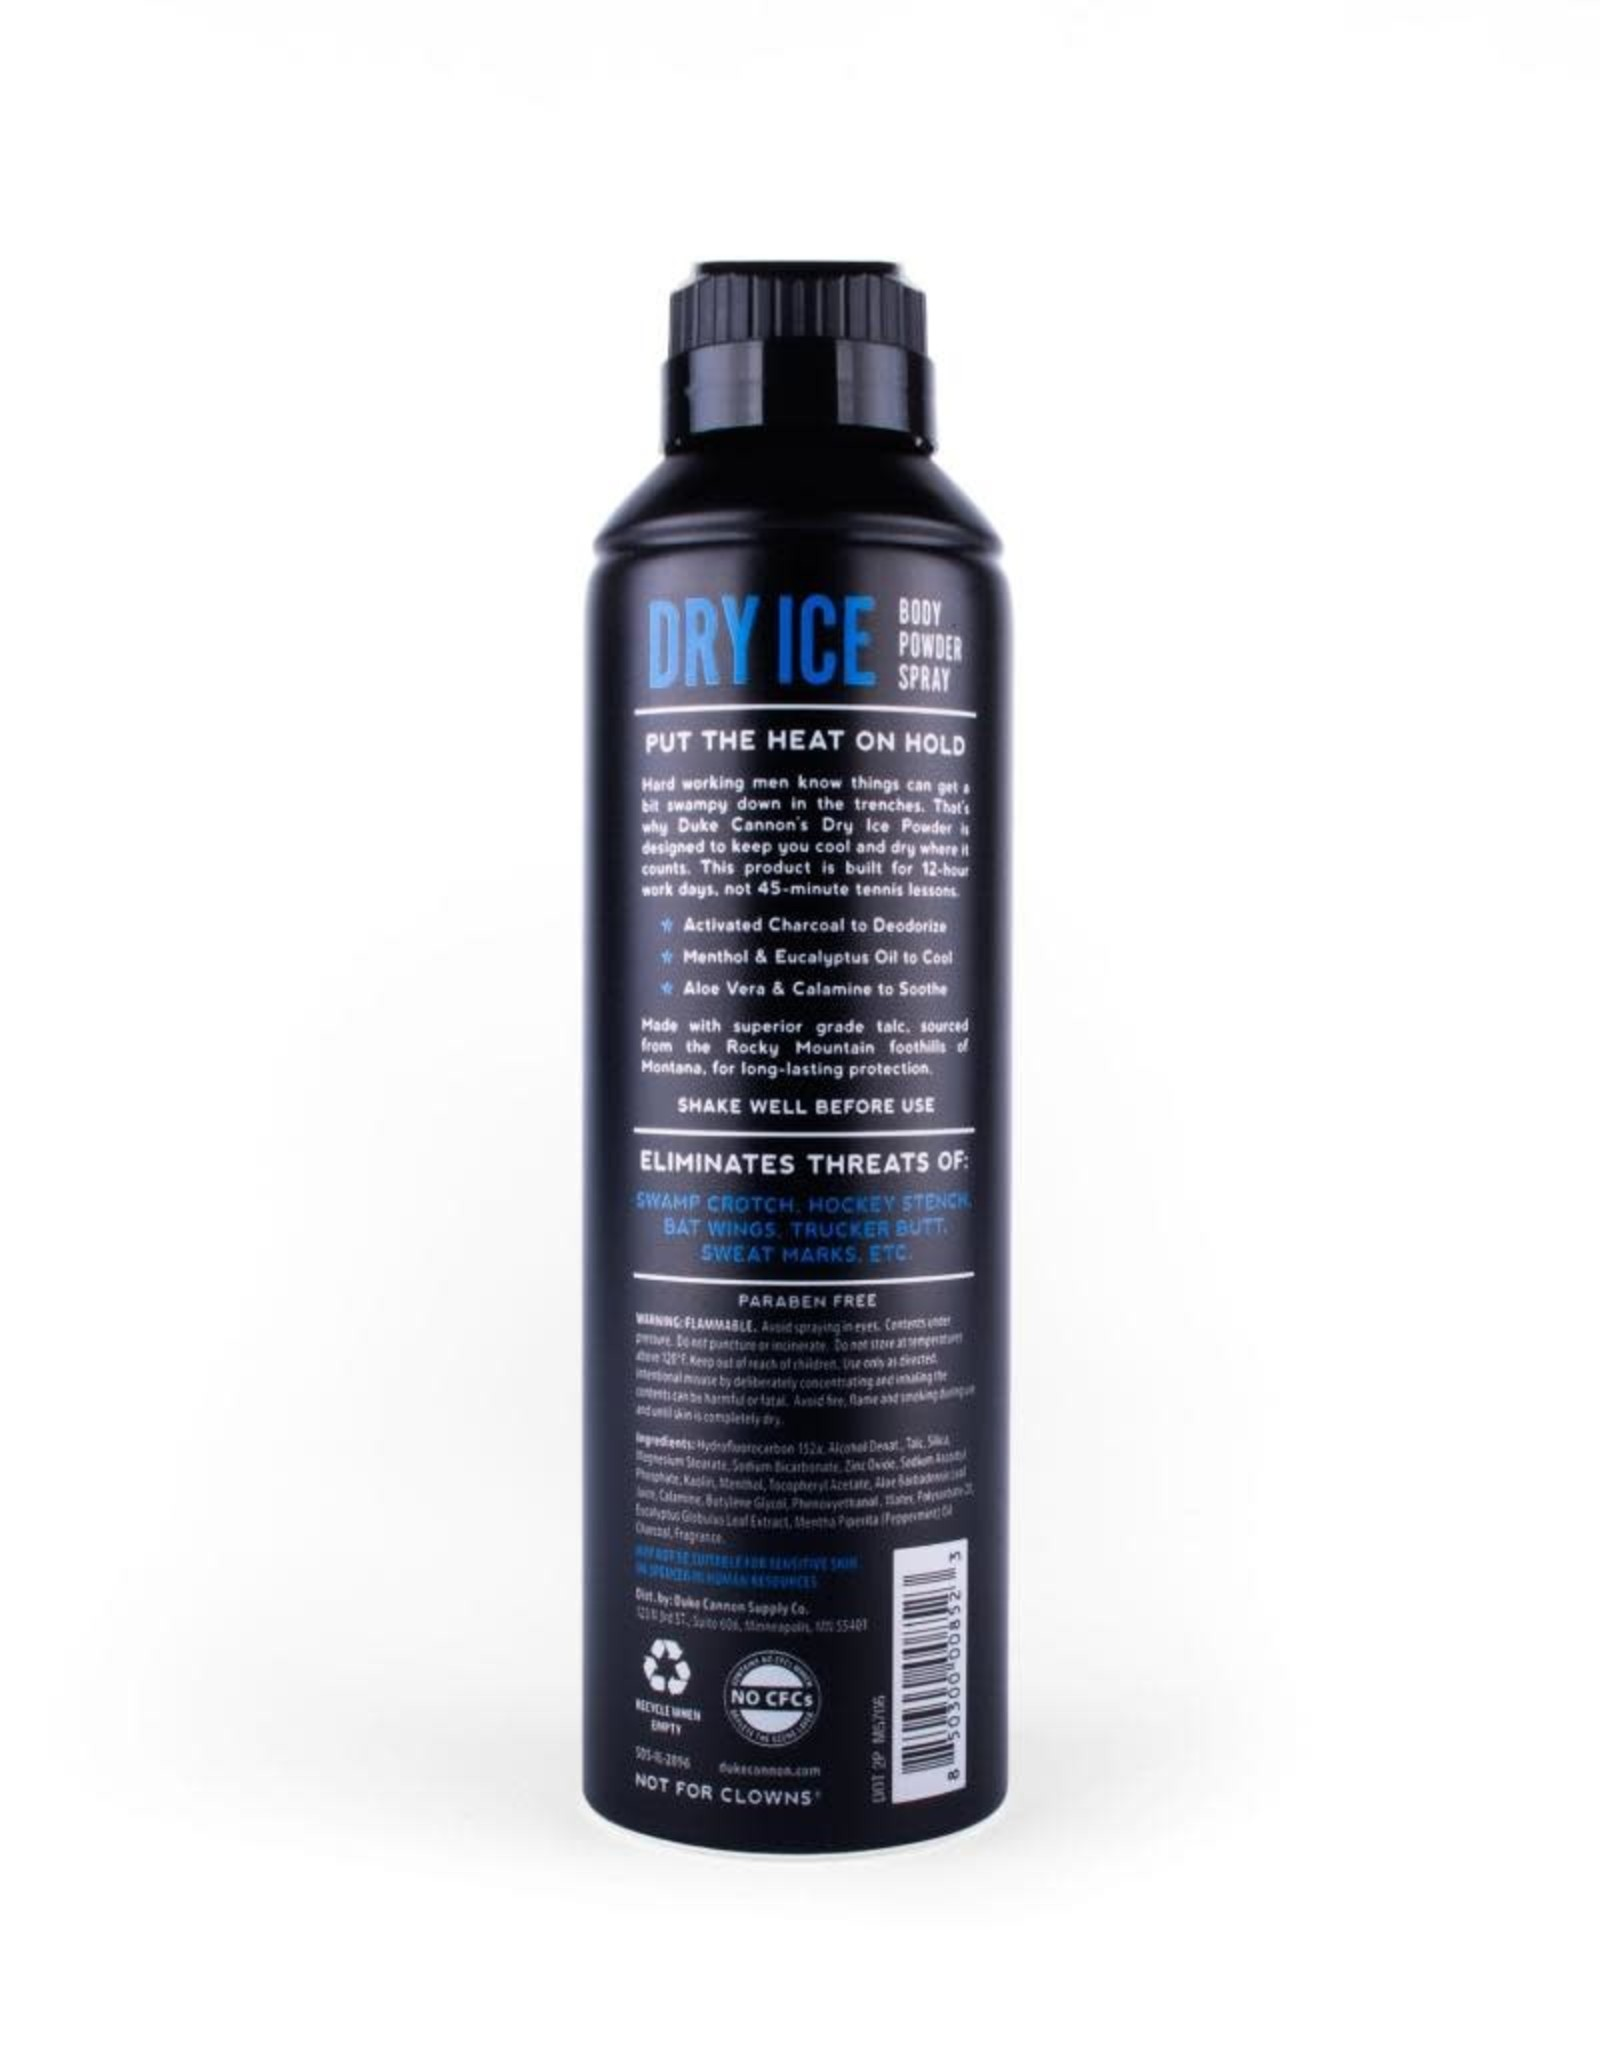 Duke Cannon Supply Co 7 oz Dry Ice Body Spray